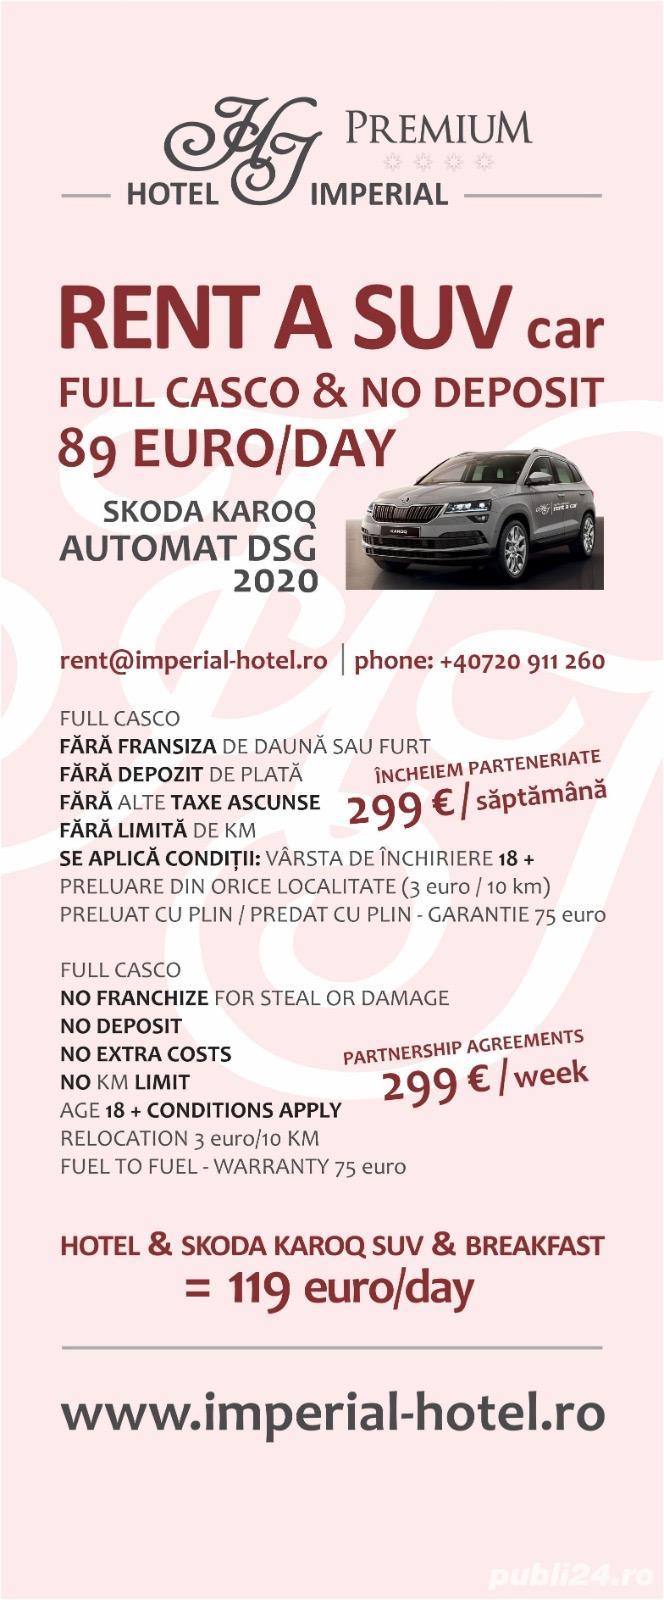 Rent / inchiriere Skoda Karoq2020dsgFullCasco no Depozit 299 Euro/WEEK